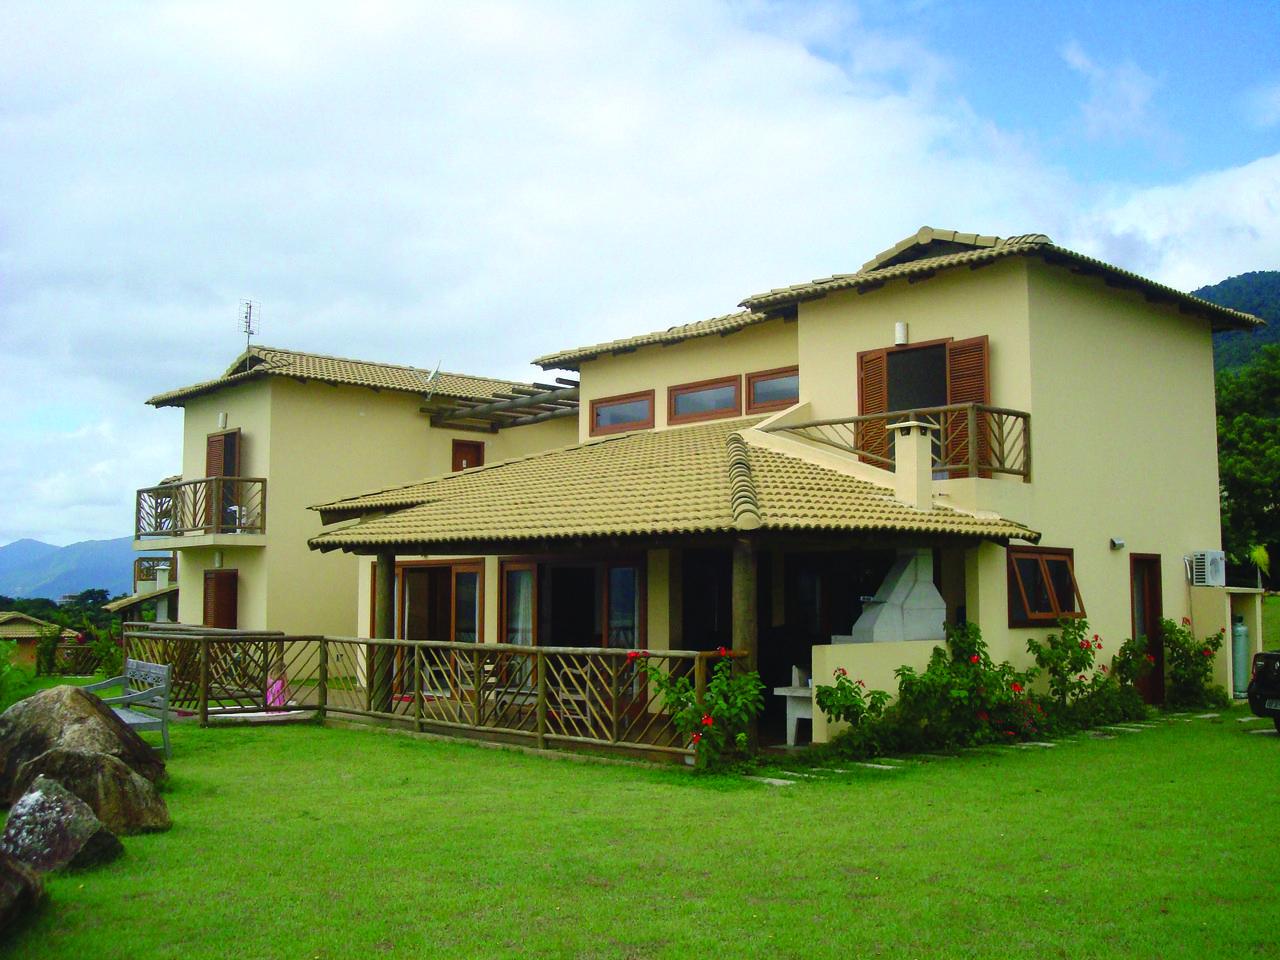 Foto casa de ilha arquitetura 12338 no viva decora for Casa immagini